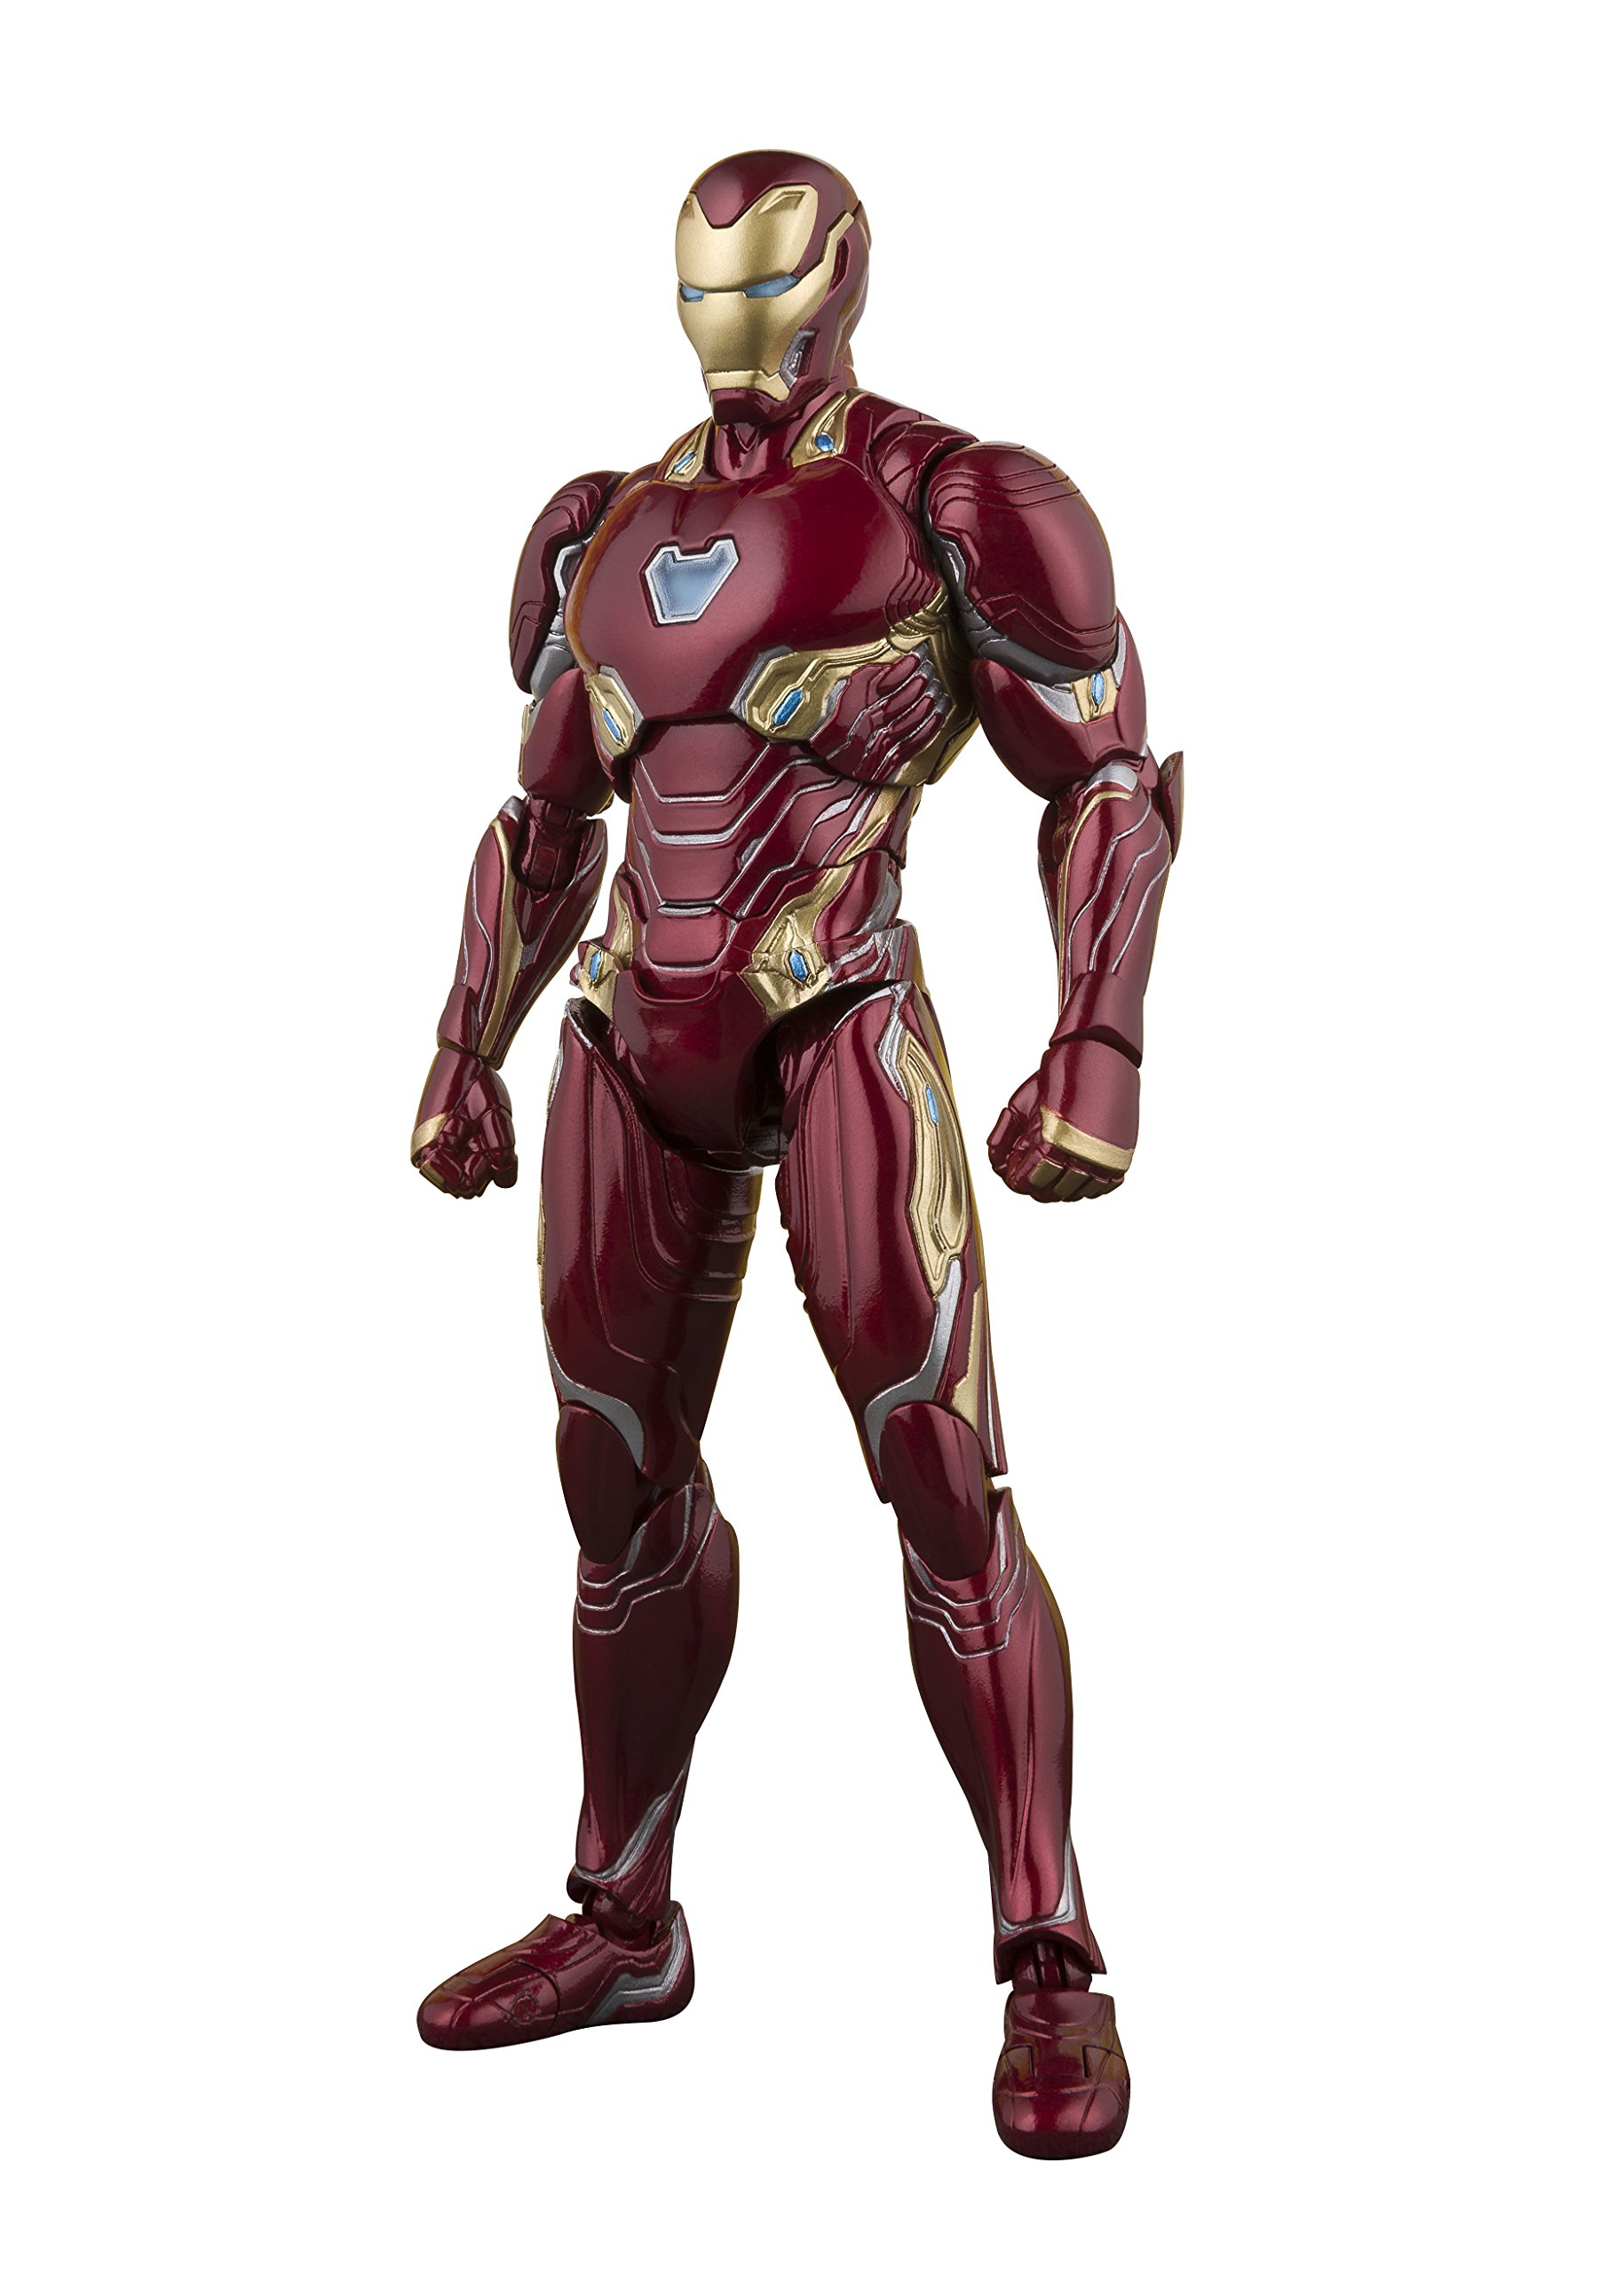 Marvel Avengers: Infinity War Based Movie Comes Iro Iron Man MK50 and Tamashii Stage Set